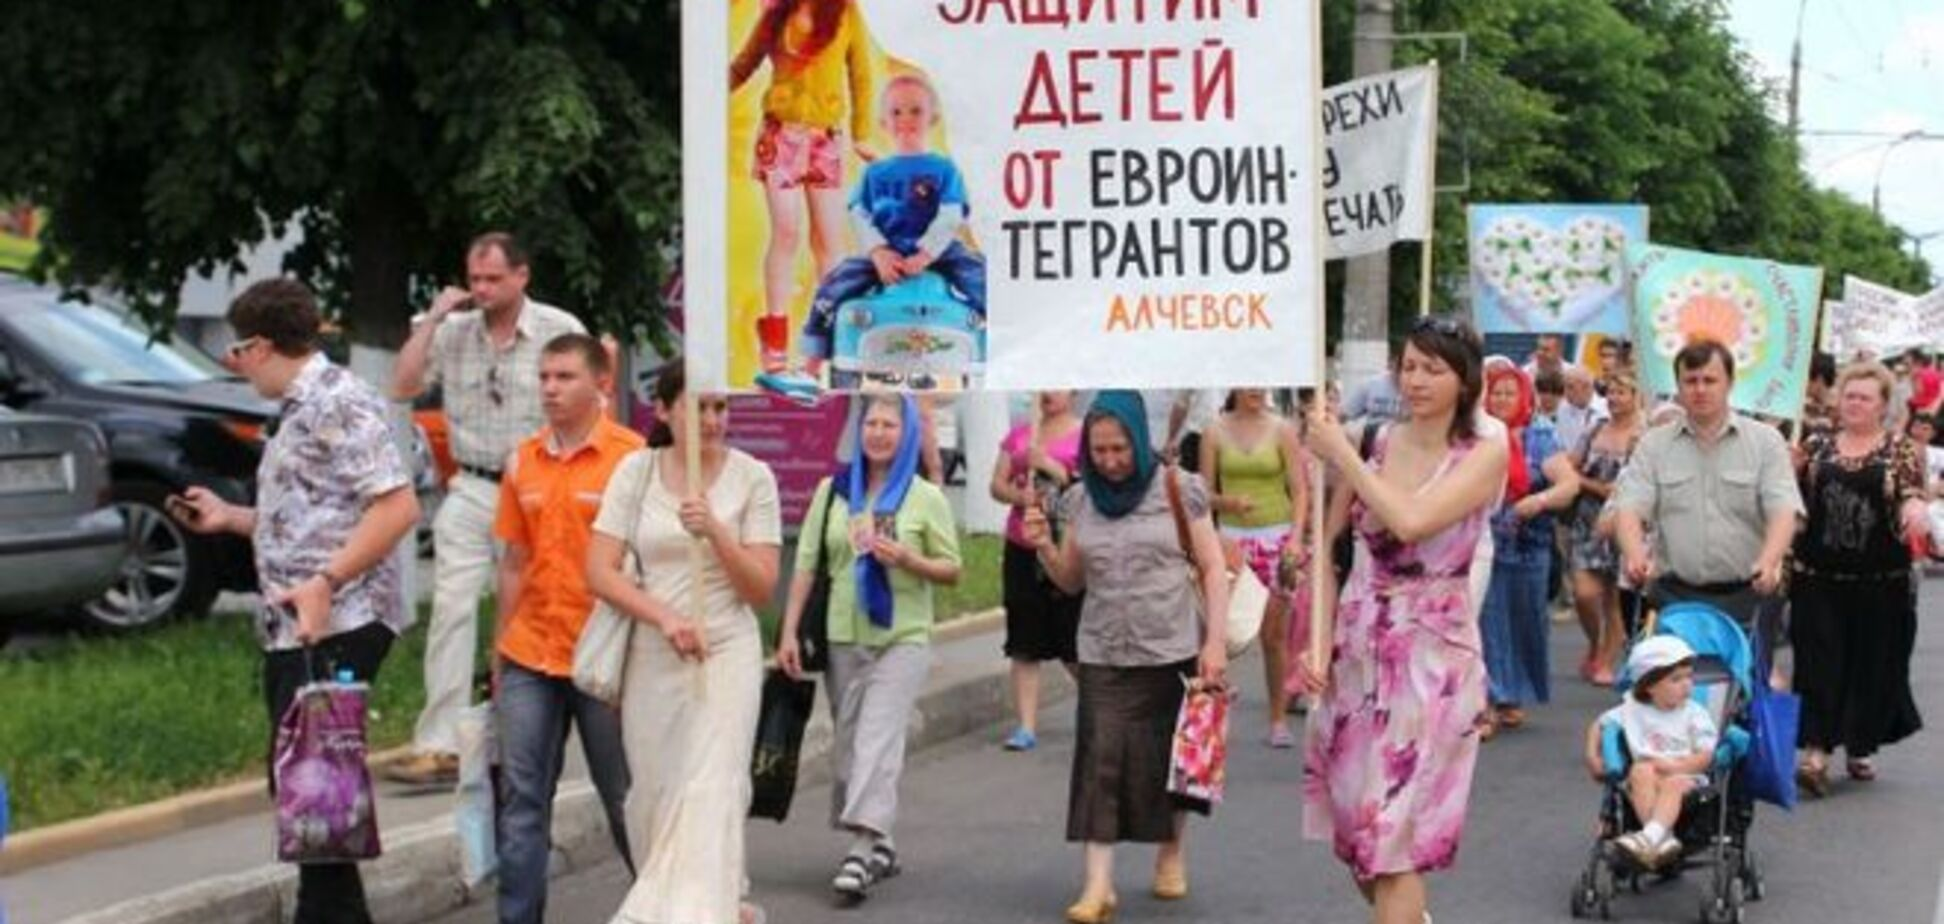 'ДНР' и 'ЛНР' перегнали Евросоюз по ценам на еду: фотофакт